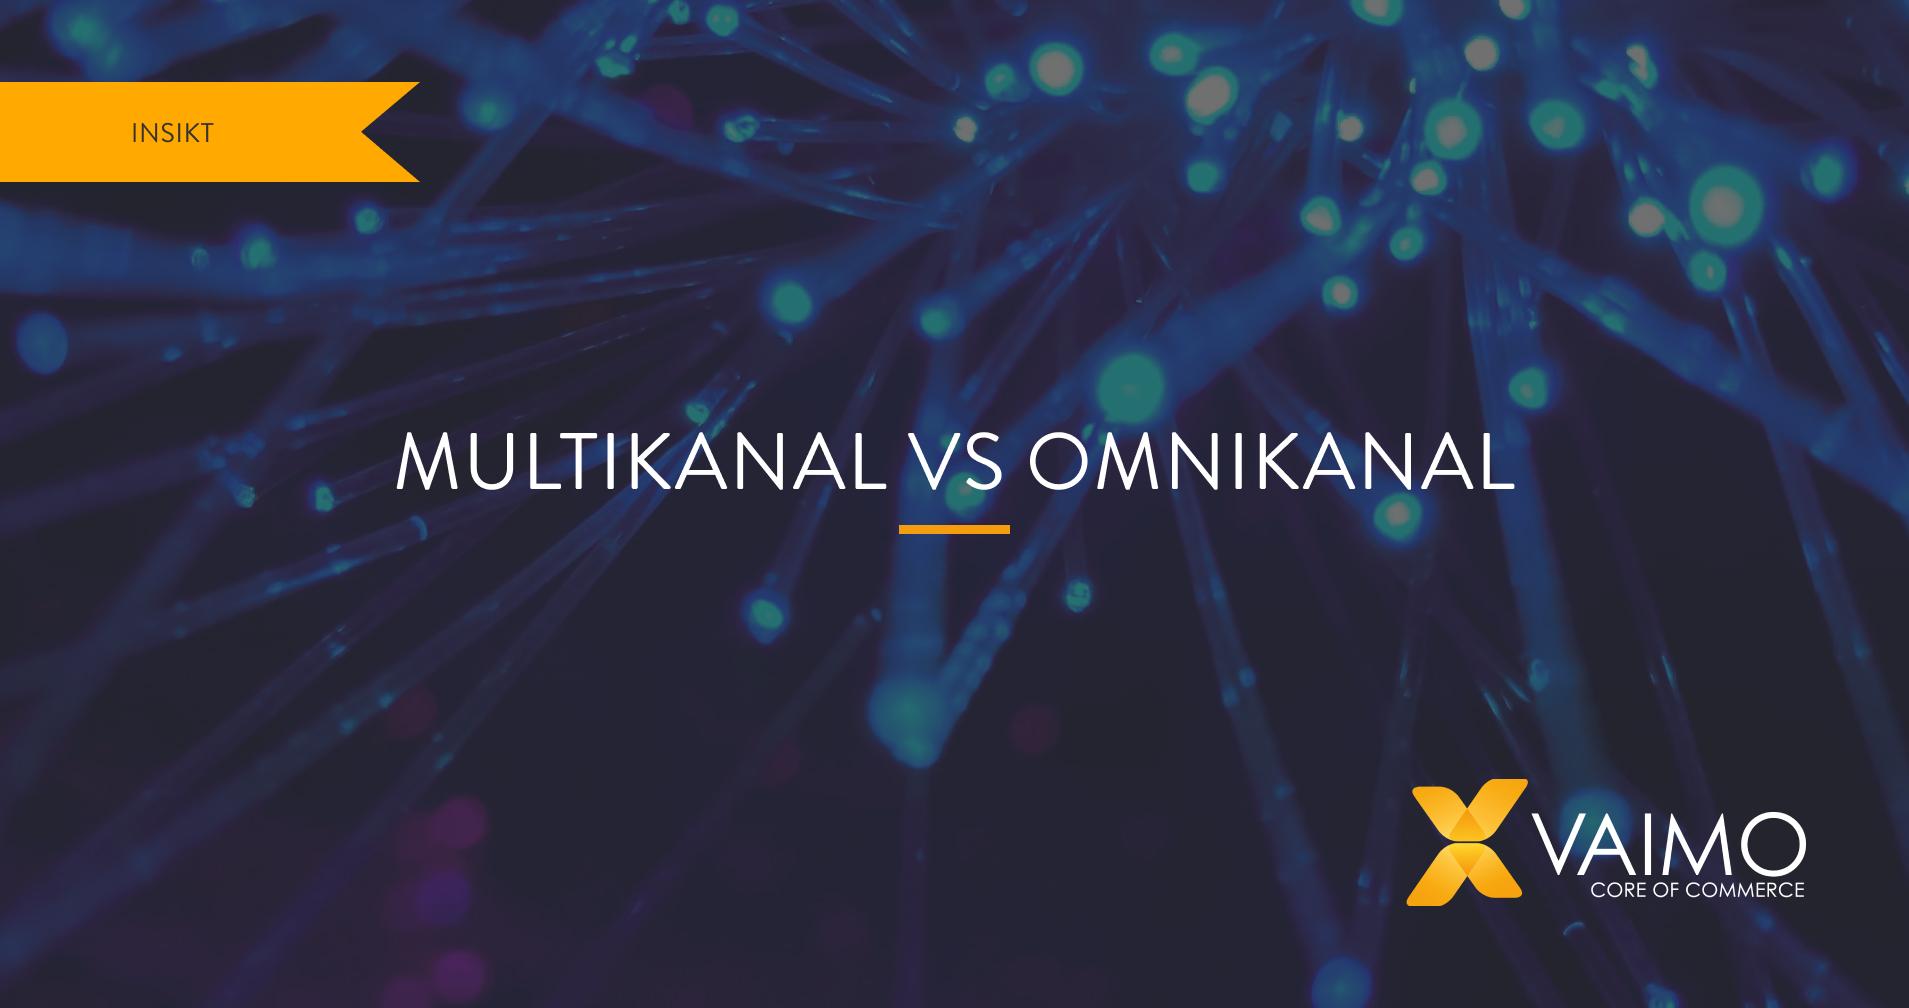 multikanal vs. omnikanal